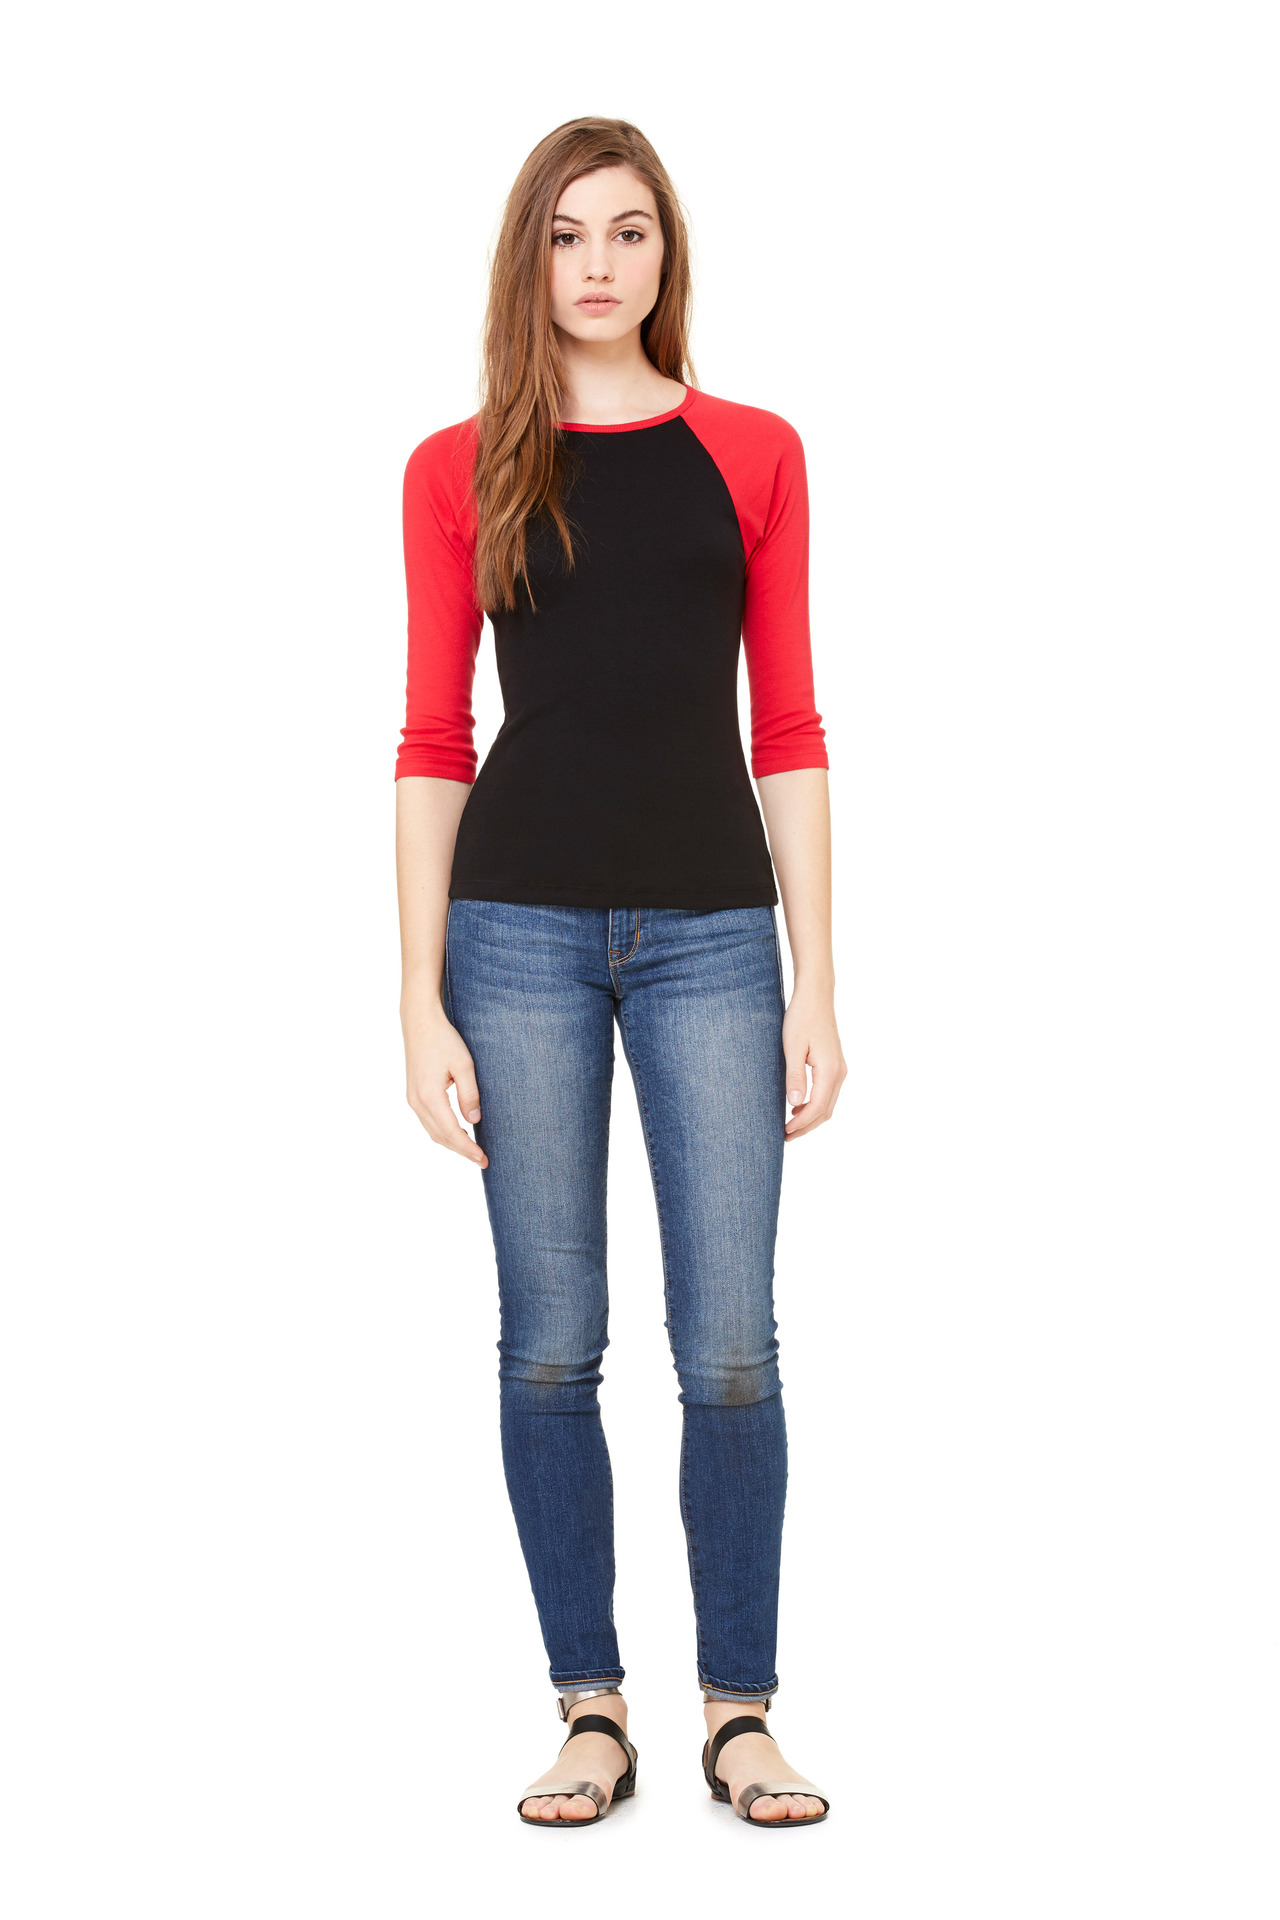 3521270add35aa Home / T-Shirts / 100% Cotton T-Shirts / Bella + Canvas Women's Baby Rib 3/4  Sleeve Contrast Raglan Tee – B2000